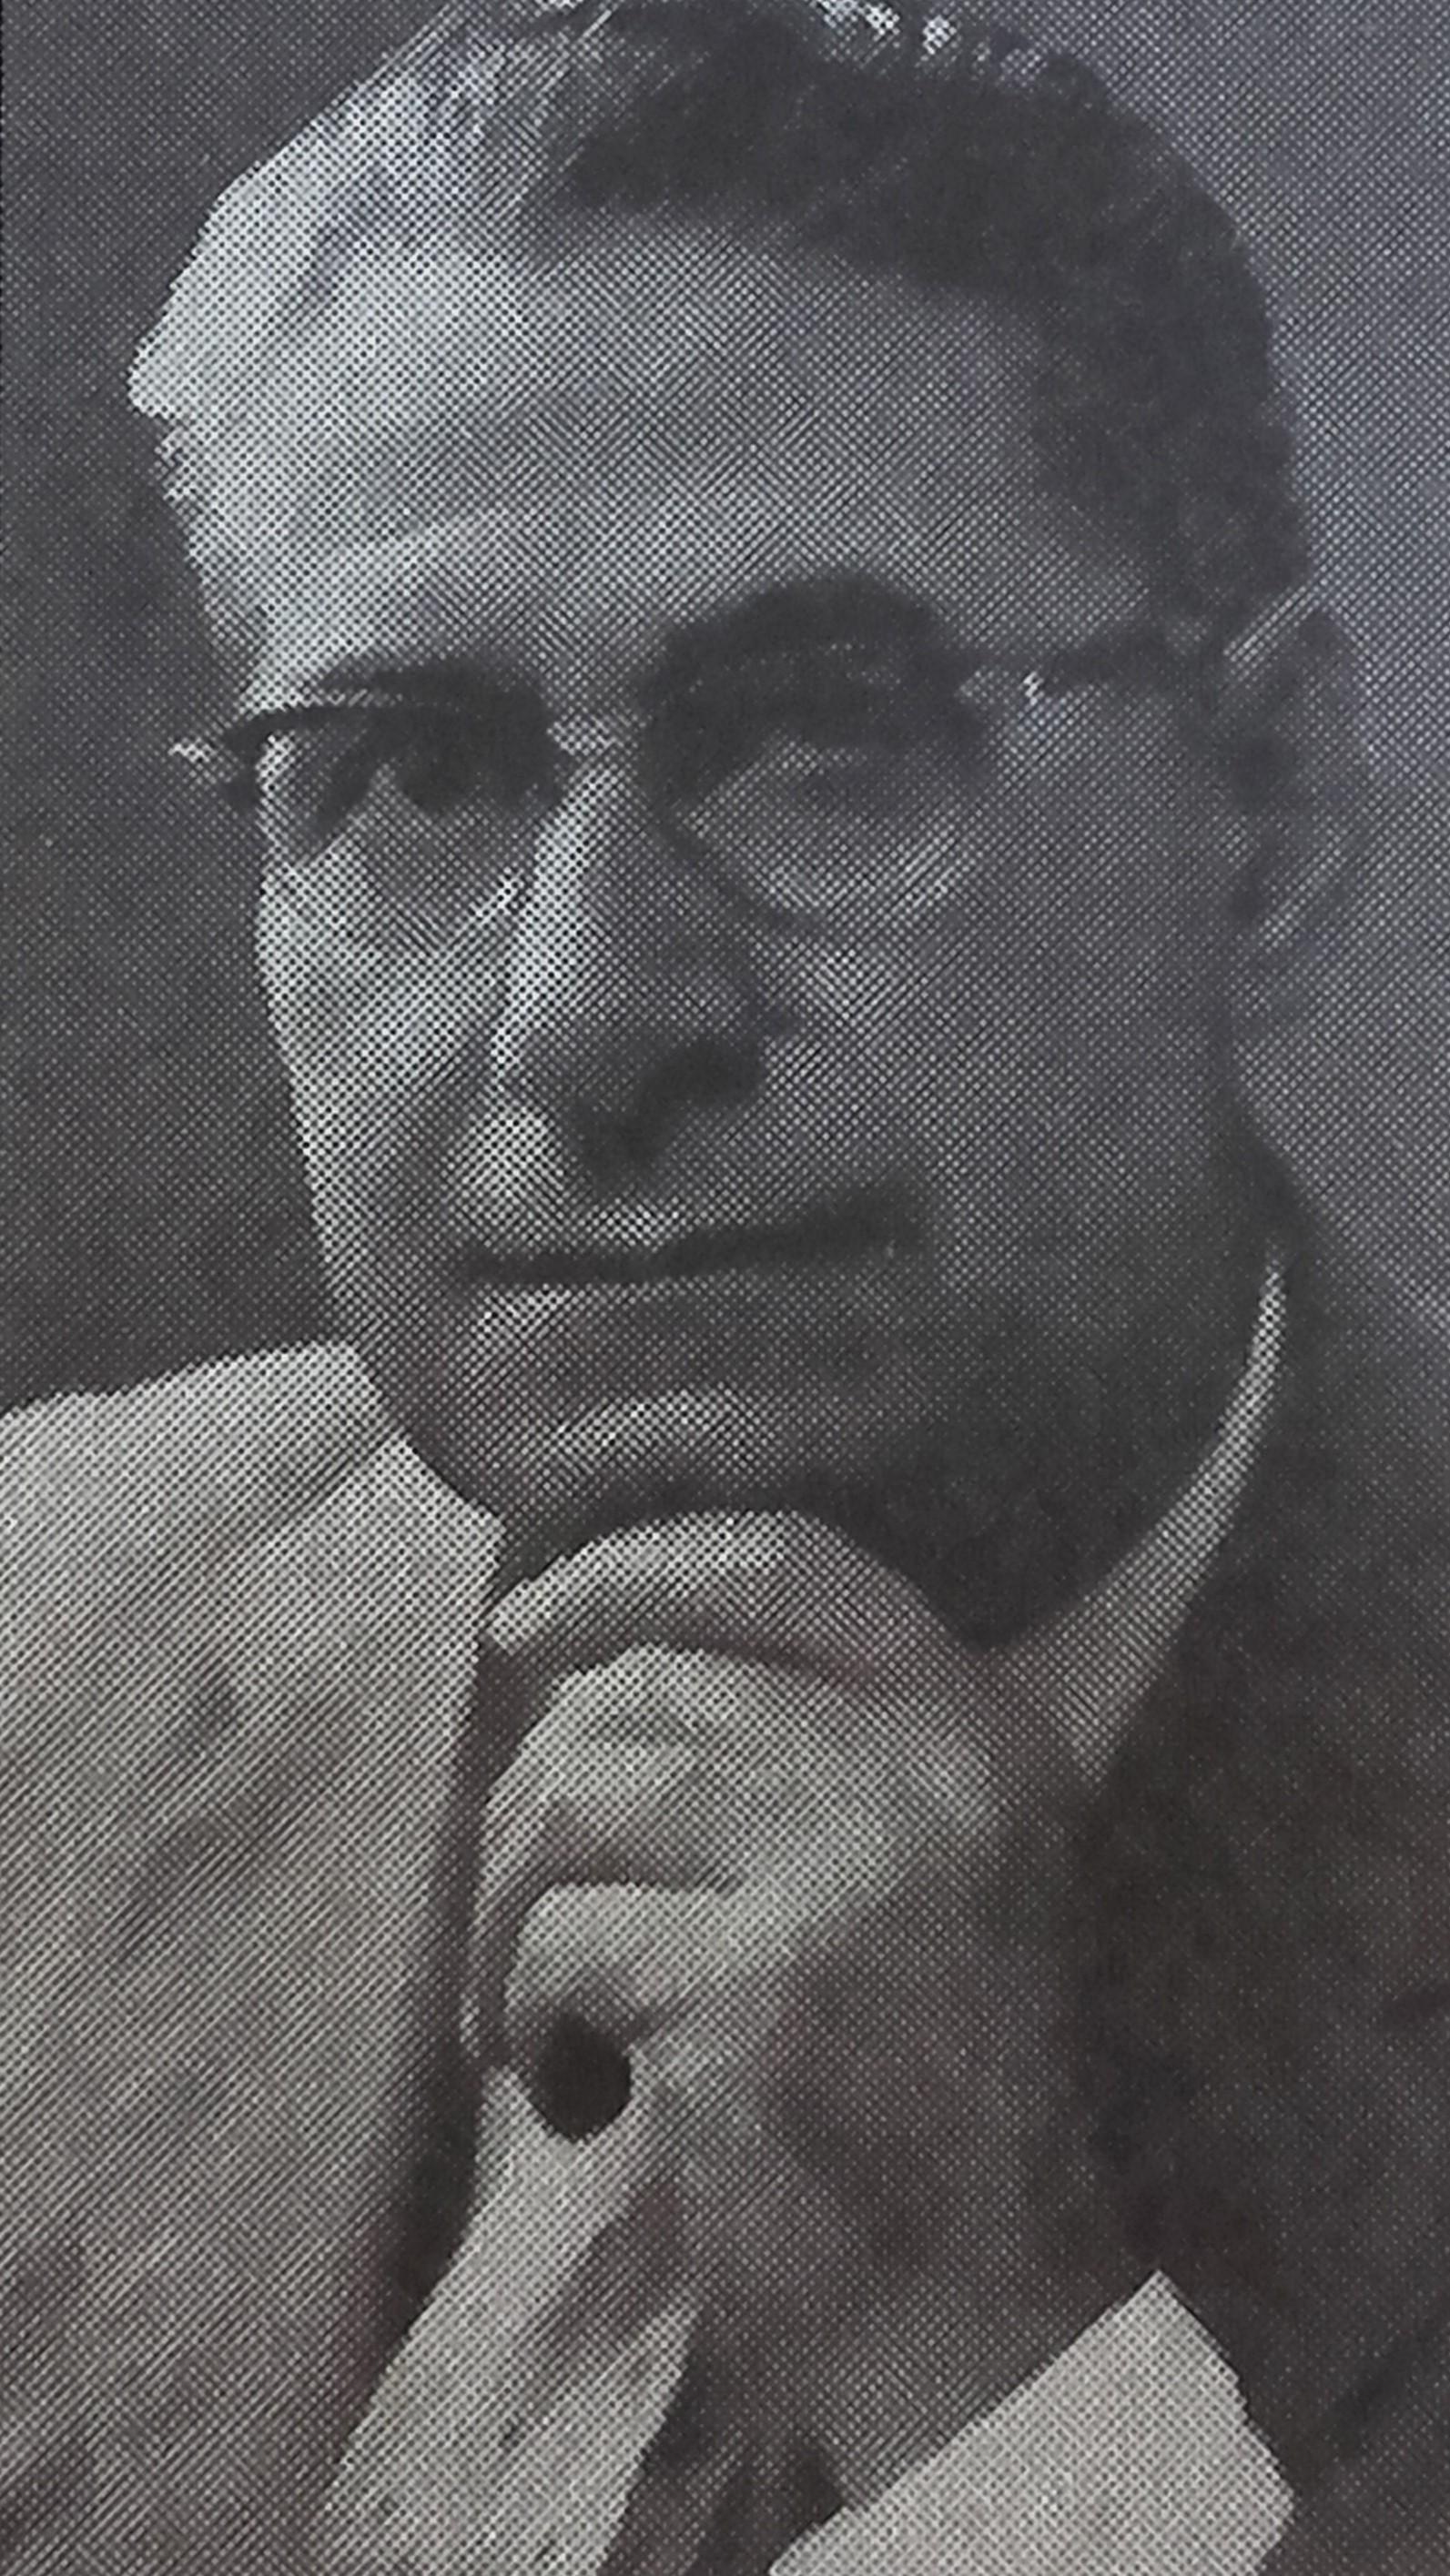 JESSÉ DE ALMEIDA